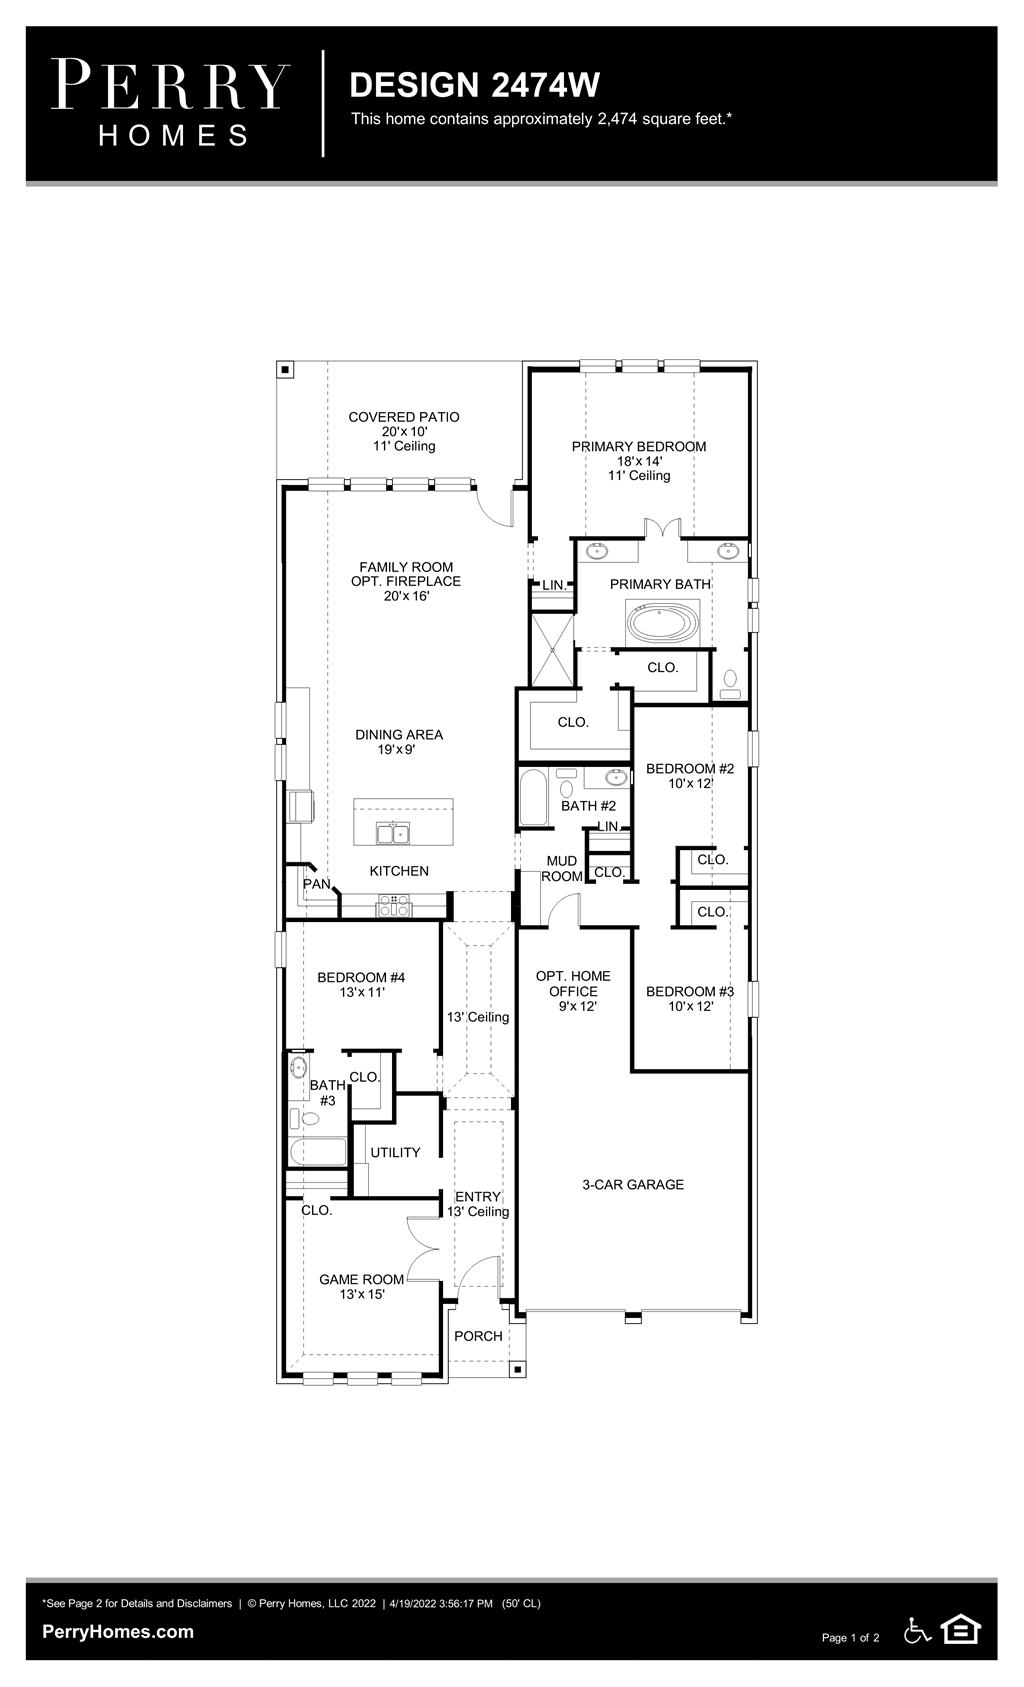 Floor Plan for 2474W